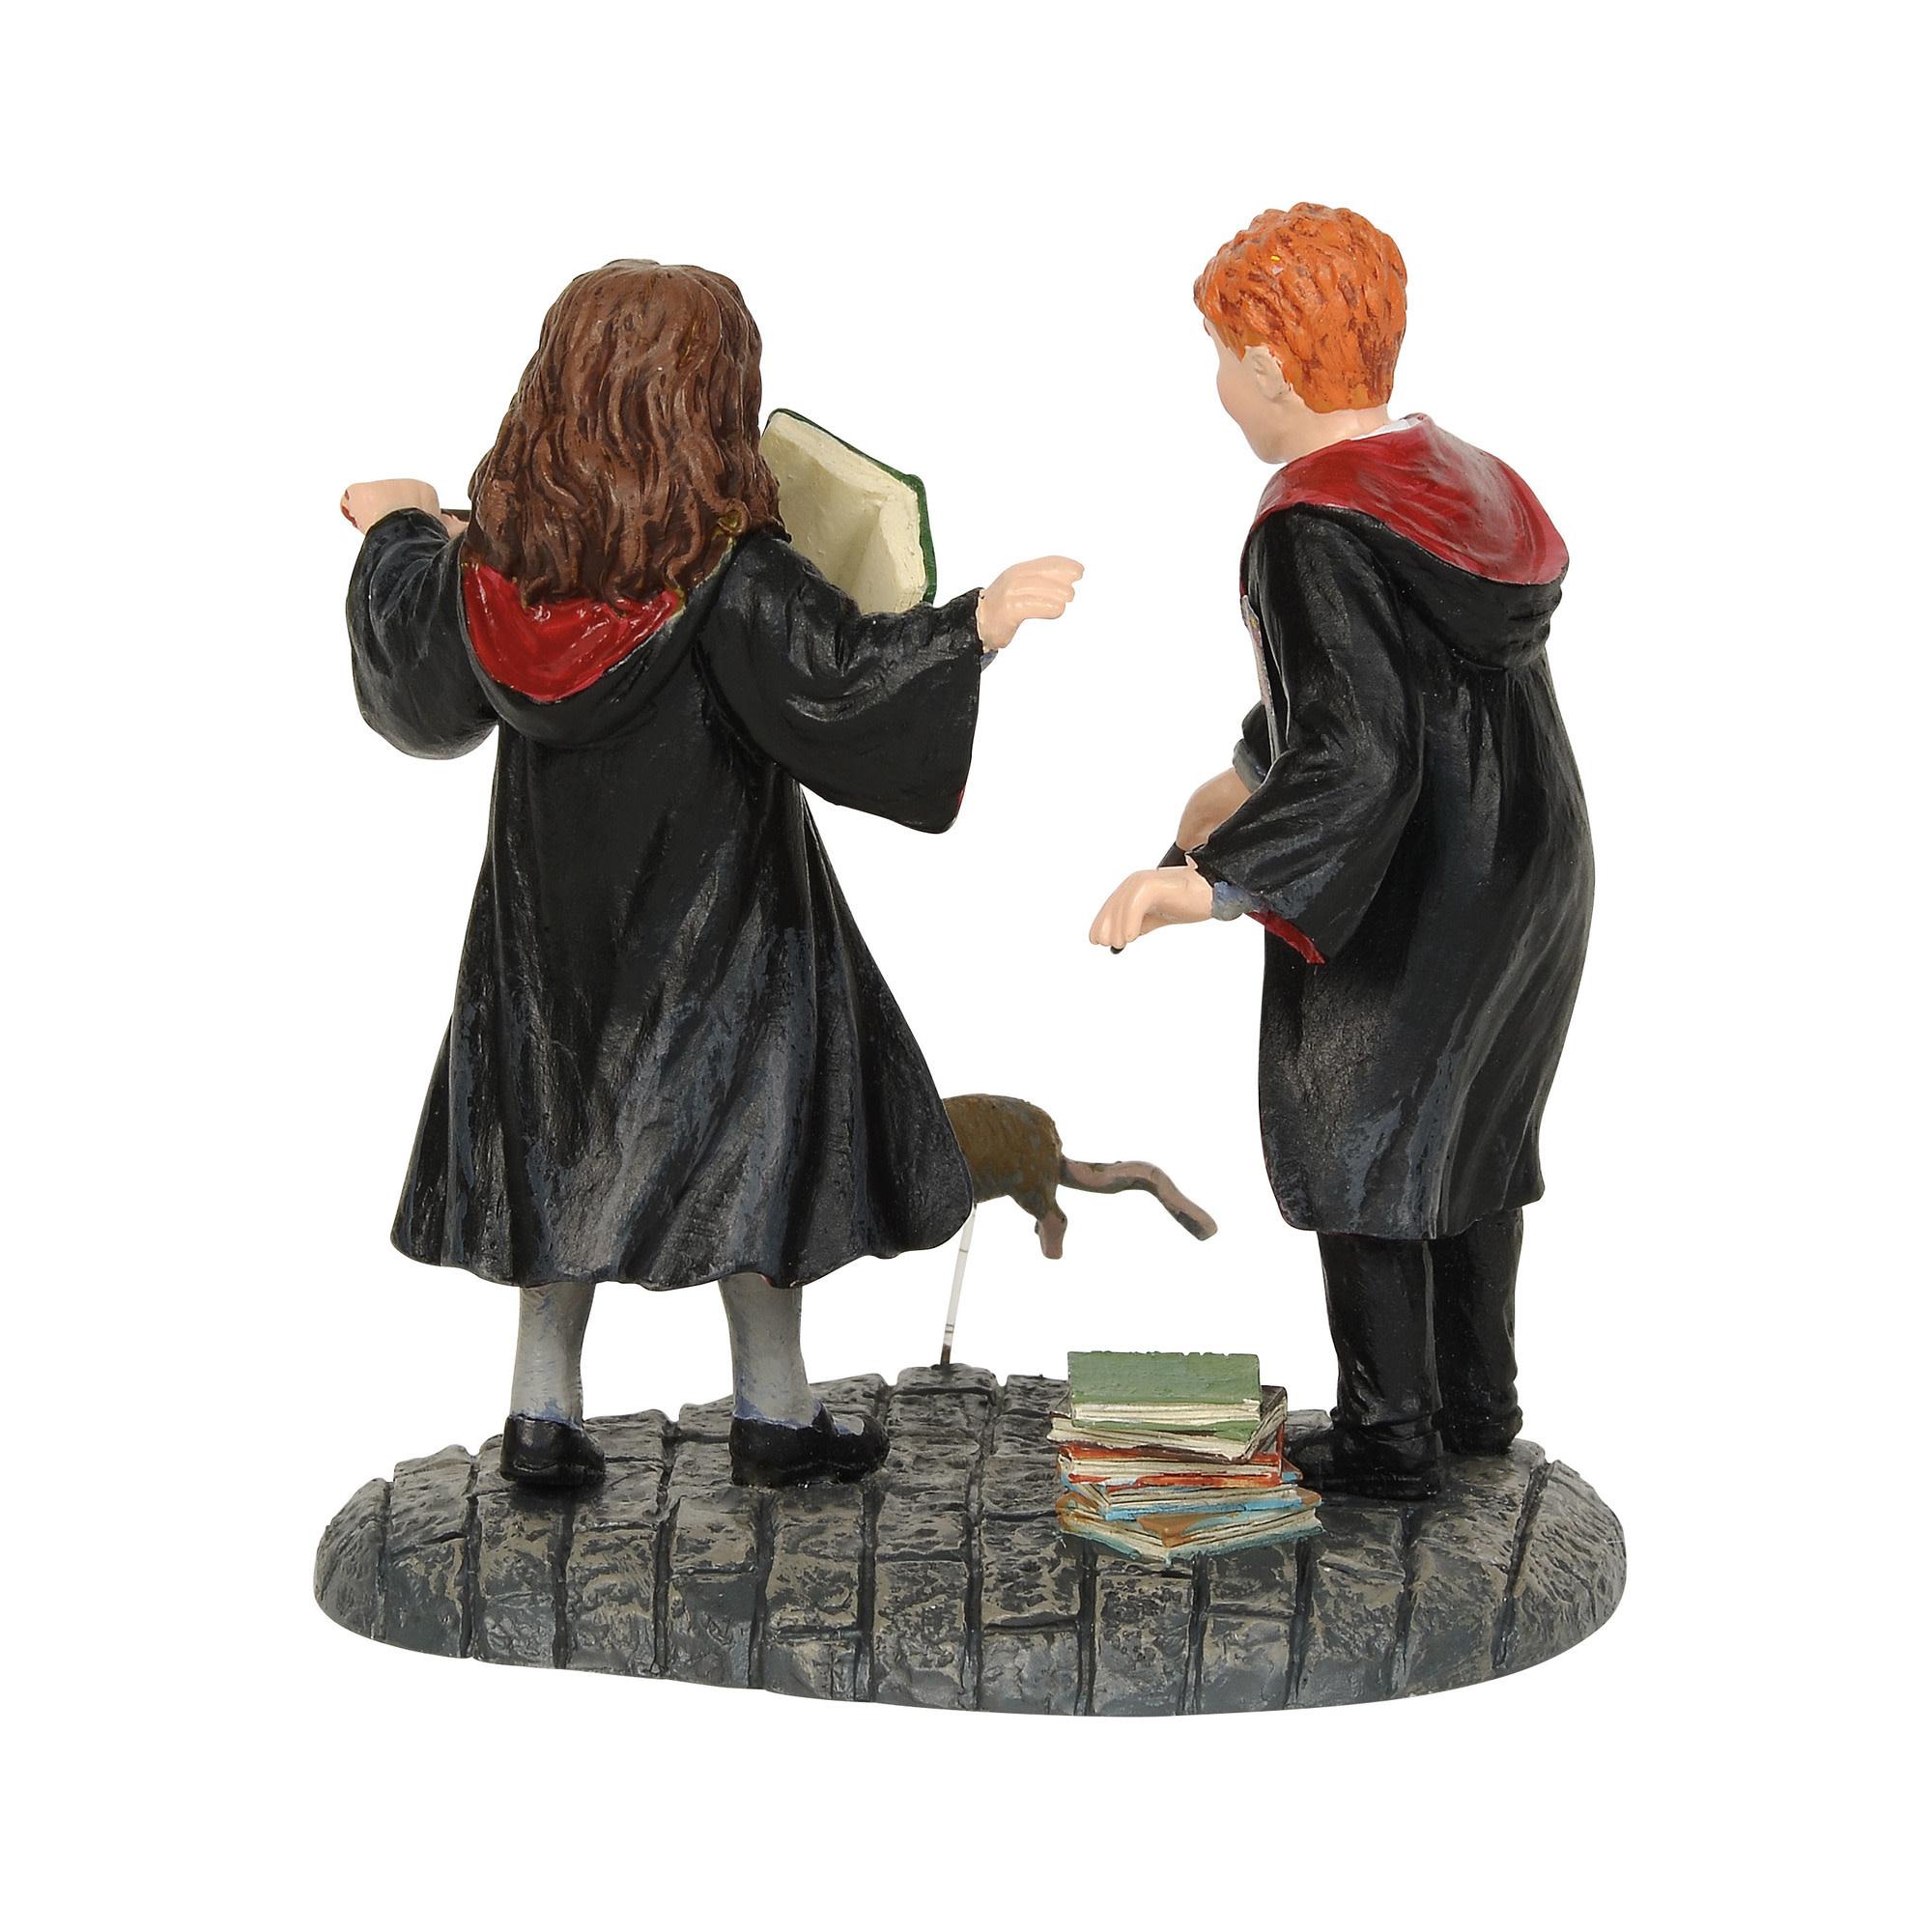 Department 56 Department 56 Harry Potter Village Wingardium Leviosa